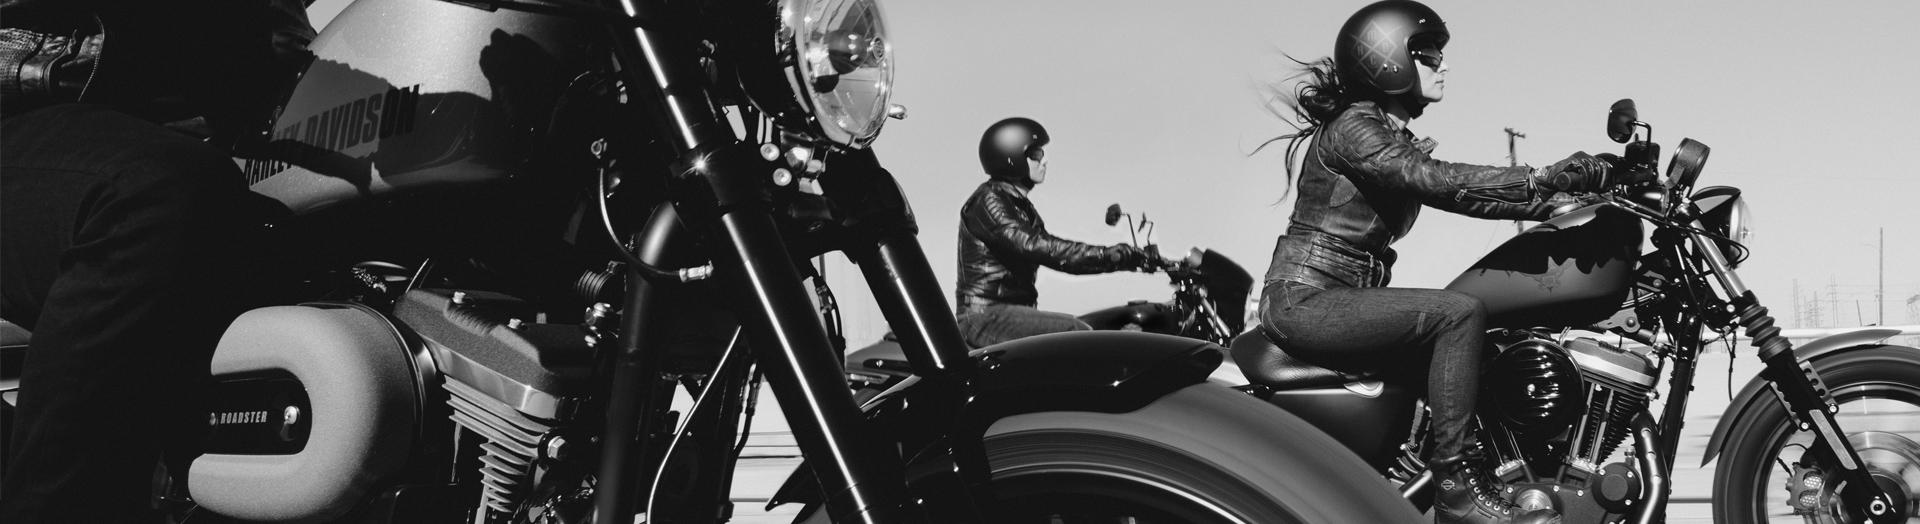 Custom Motorbike Apparels